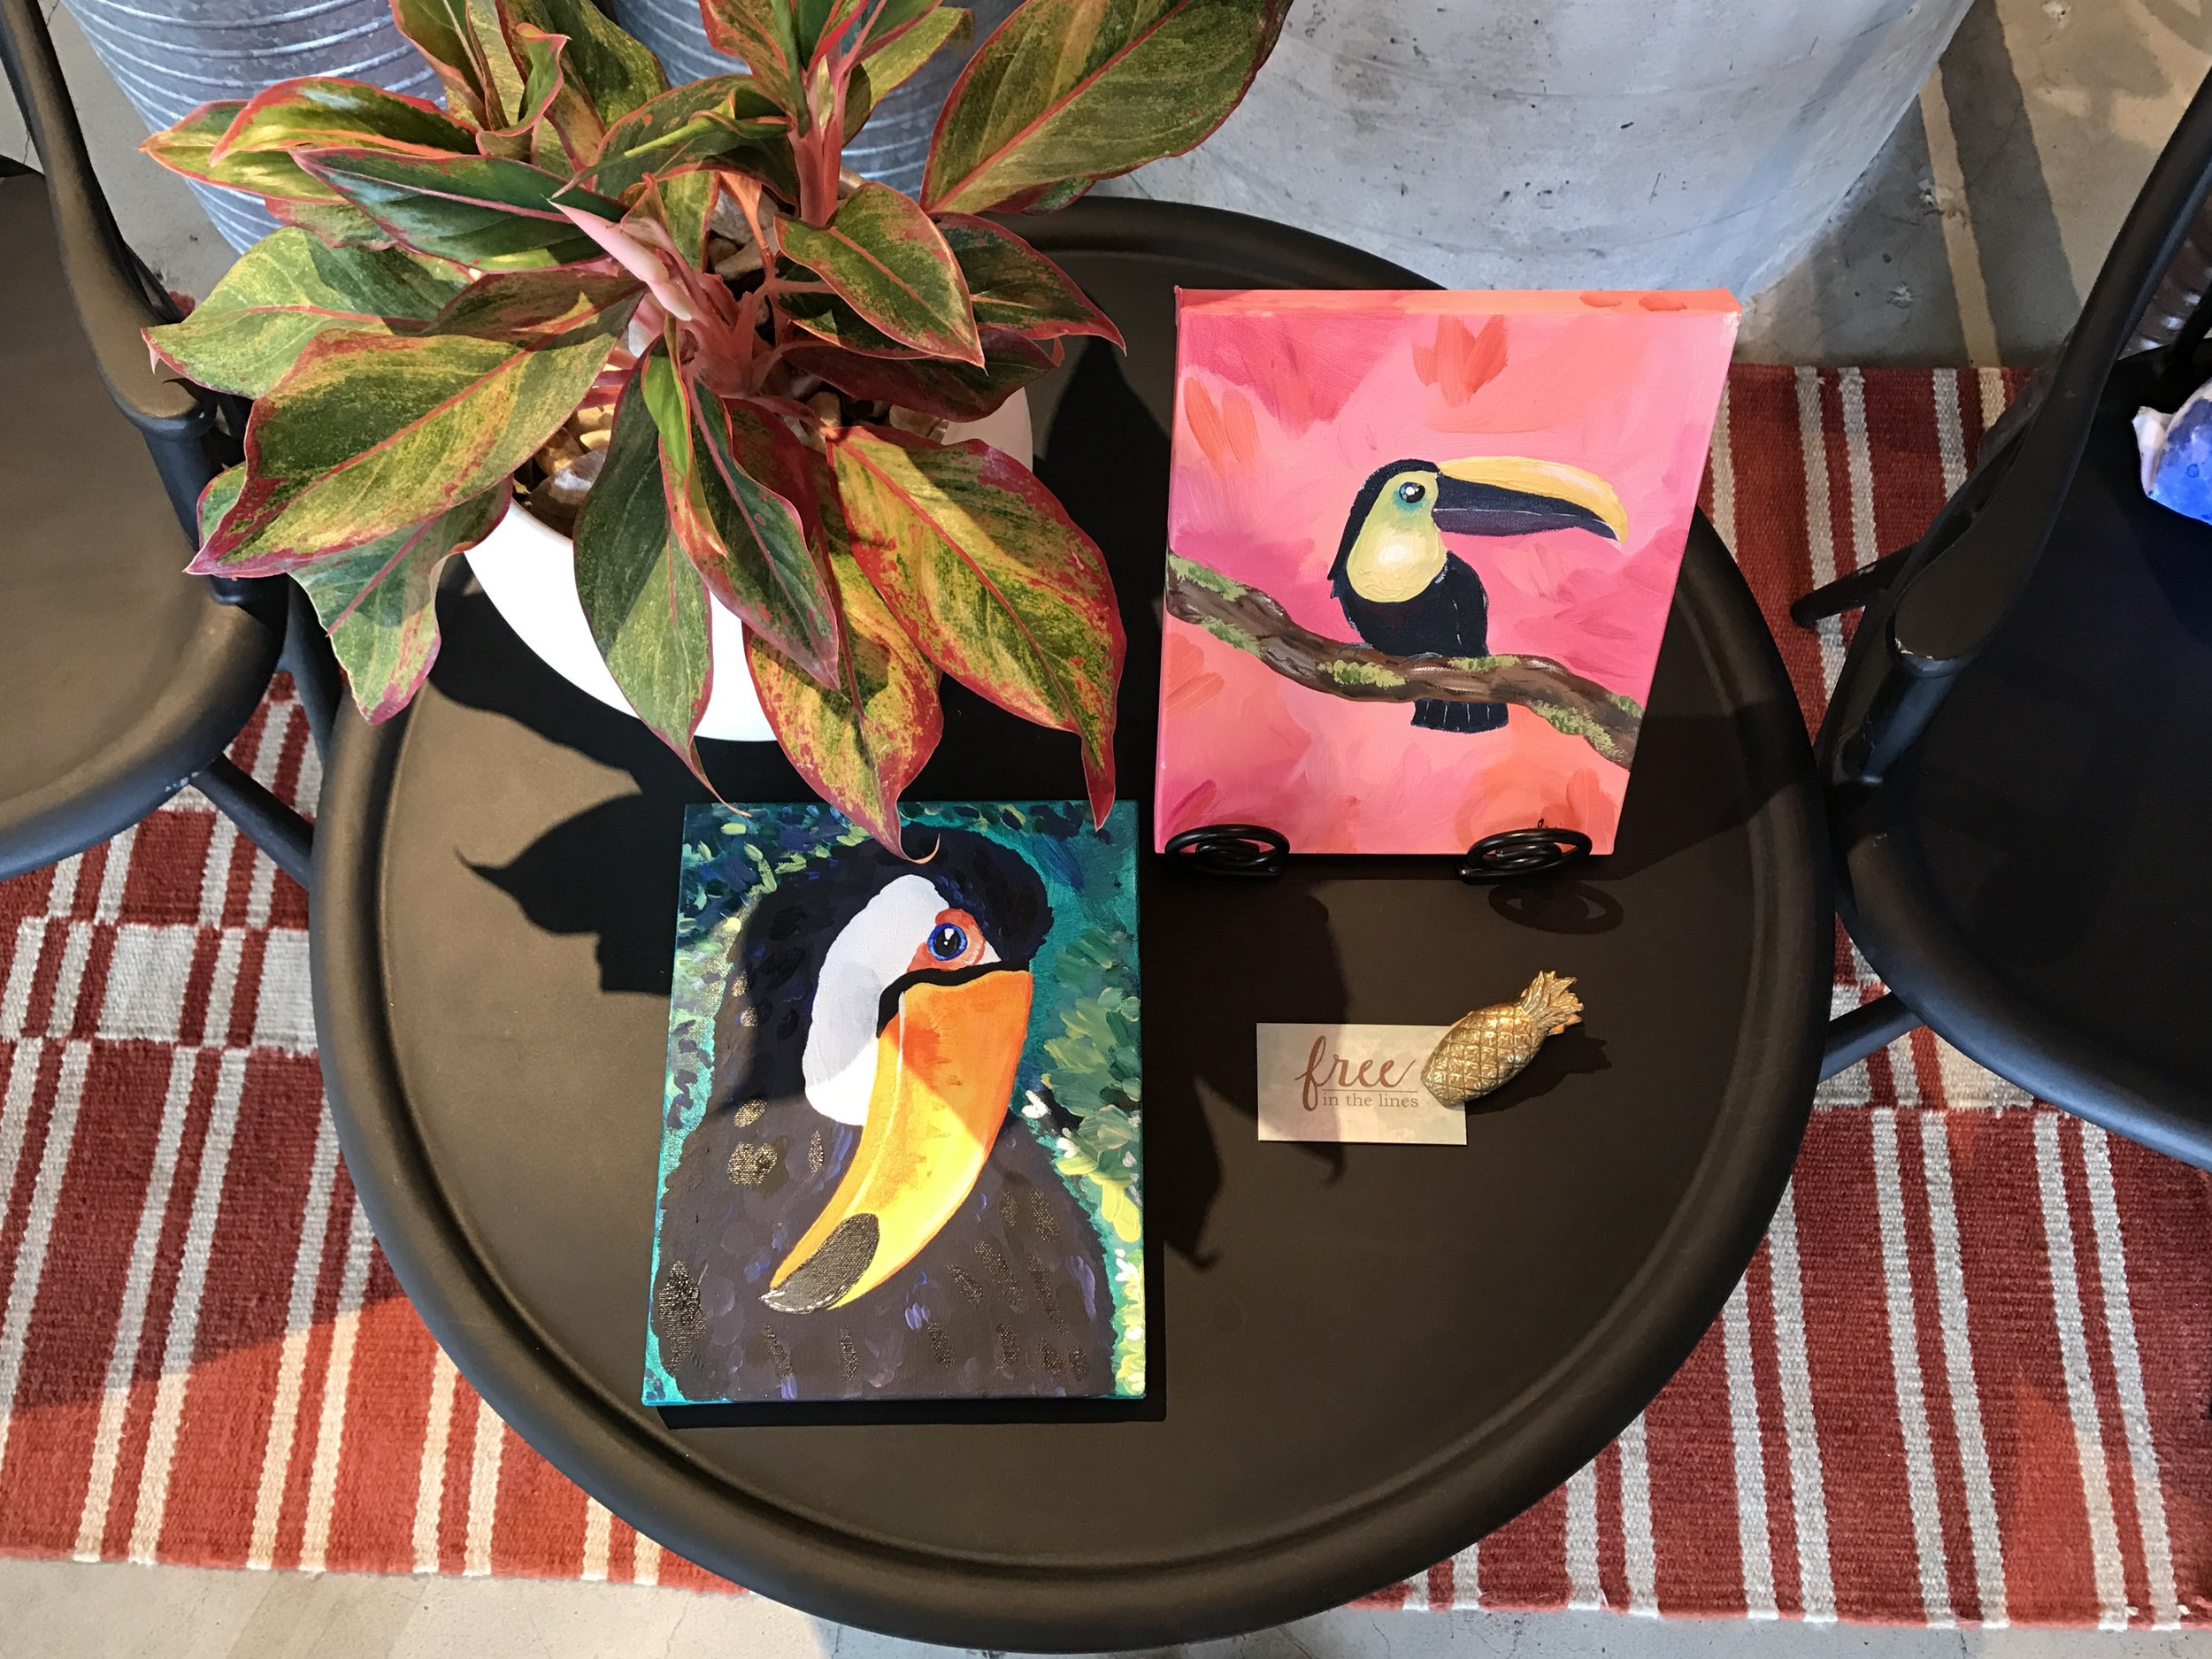 bashful-toucan-on-display.jpg